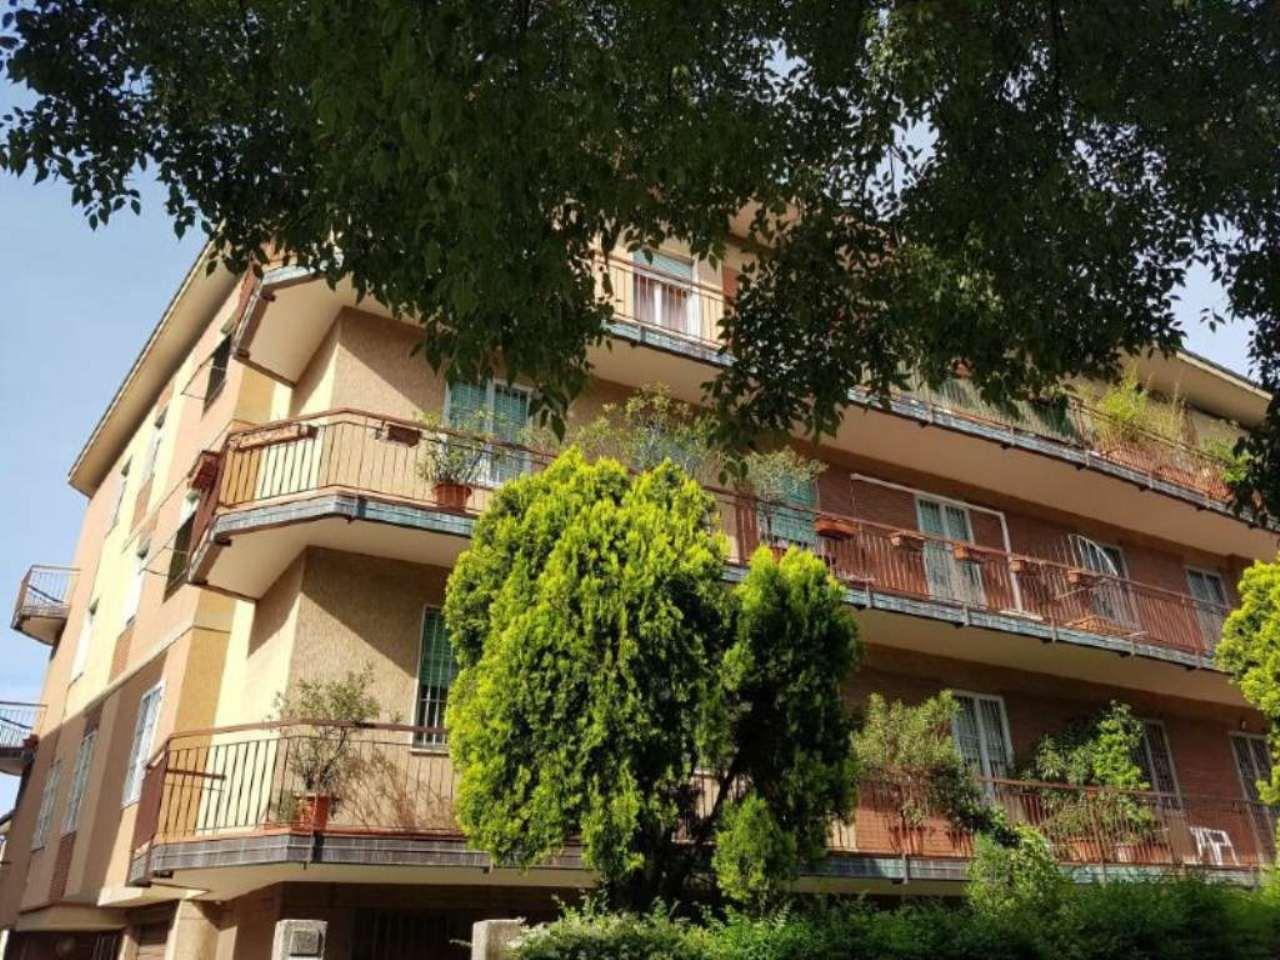 Bilocale Brescia Via Torricella Di Sopra 13